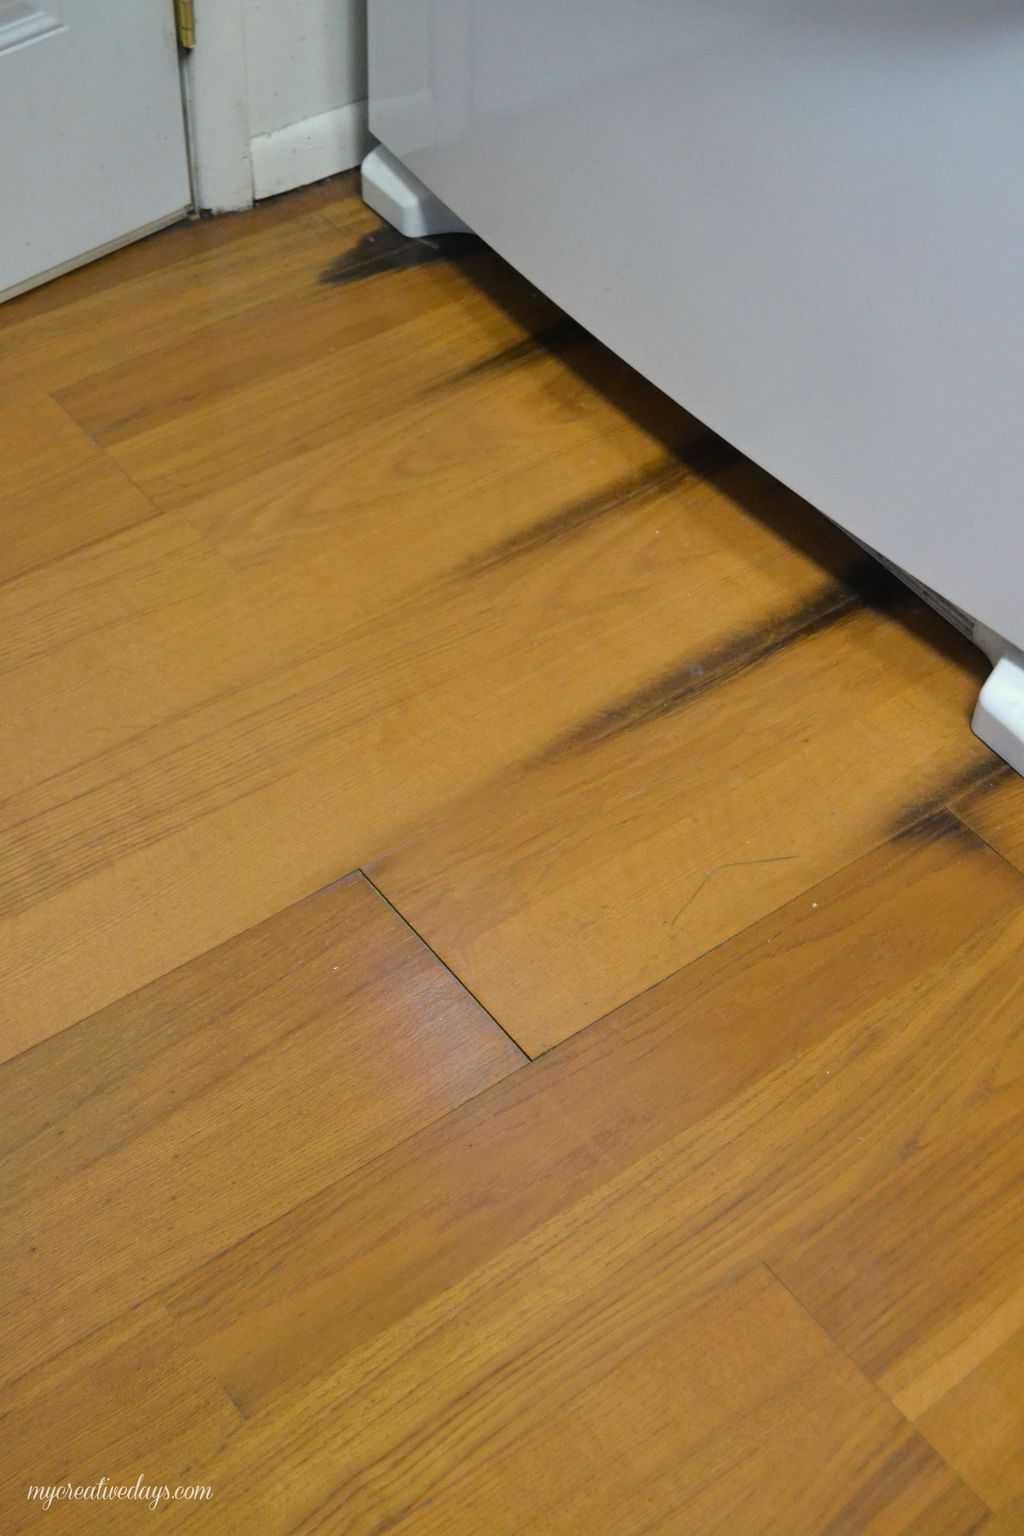 kitchen makeover laminate flooring laminate flooring kitchen Pin this Kitchen Makeover Laying Laminate Flooring mycreativedays com